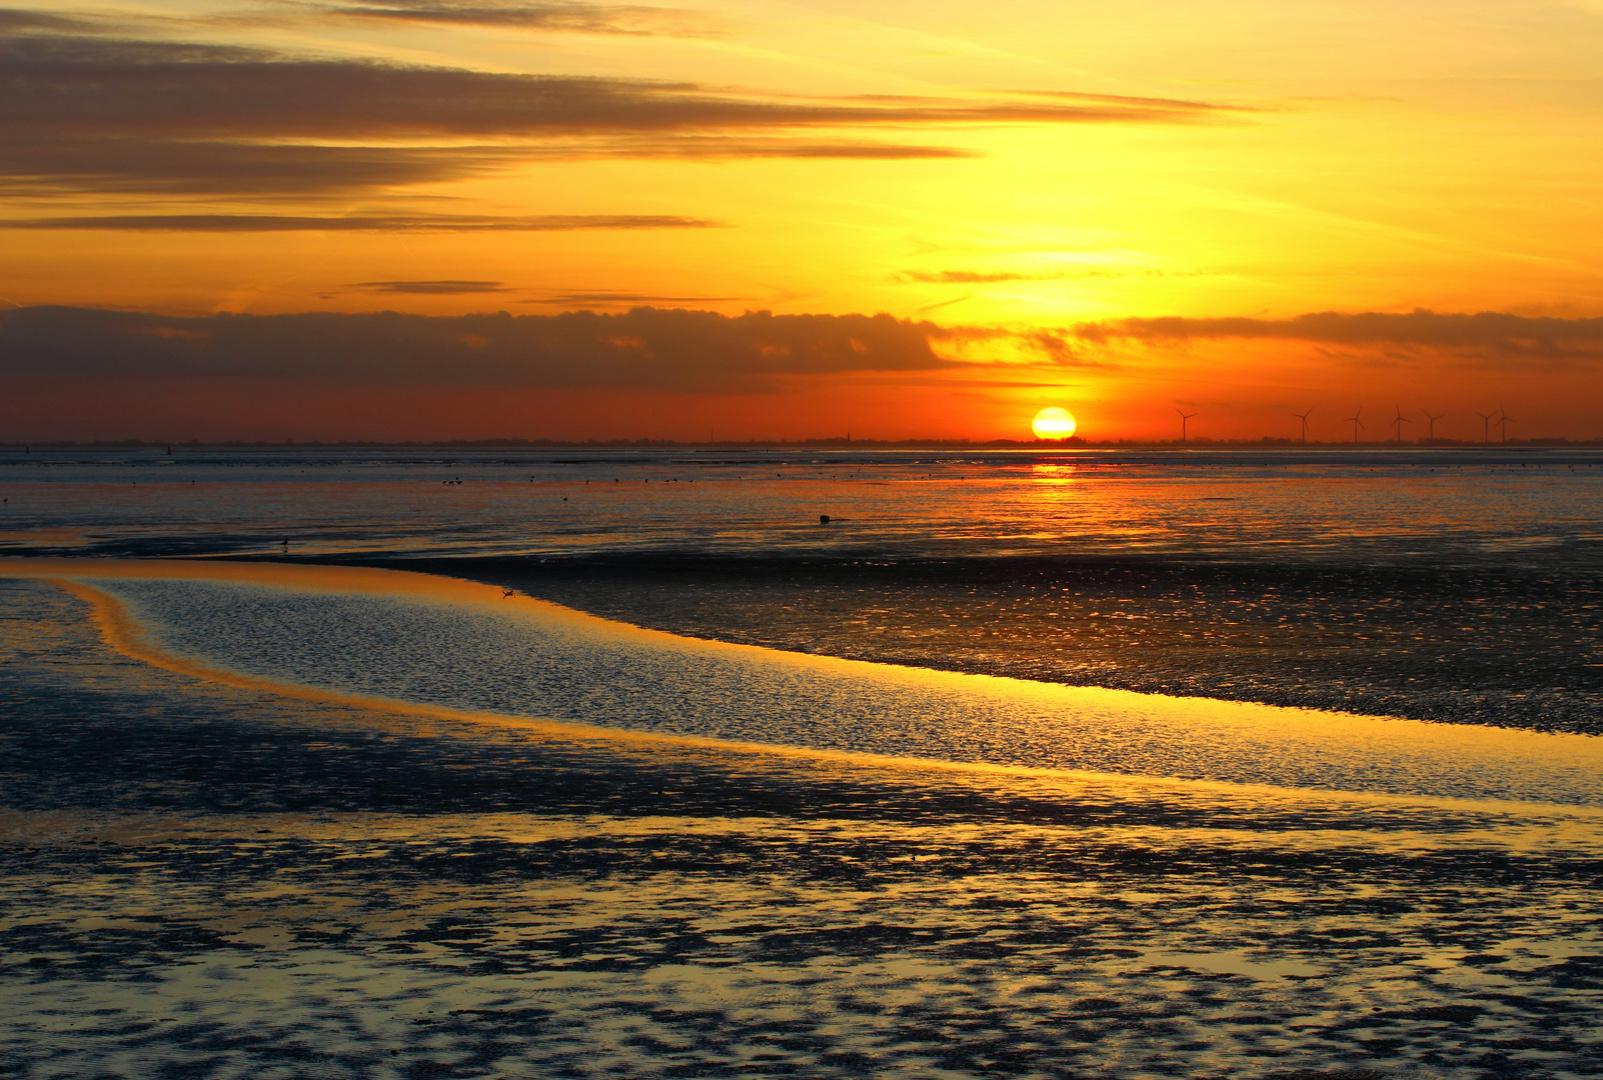 Sonnenuntergang 12.01.2014